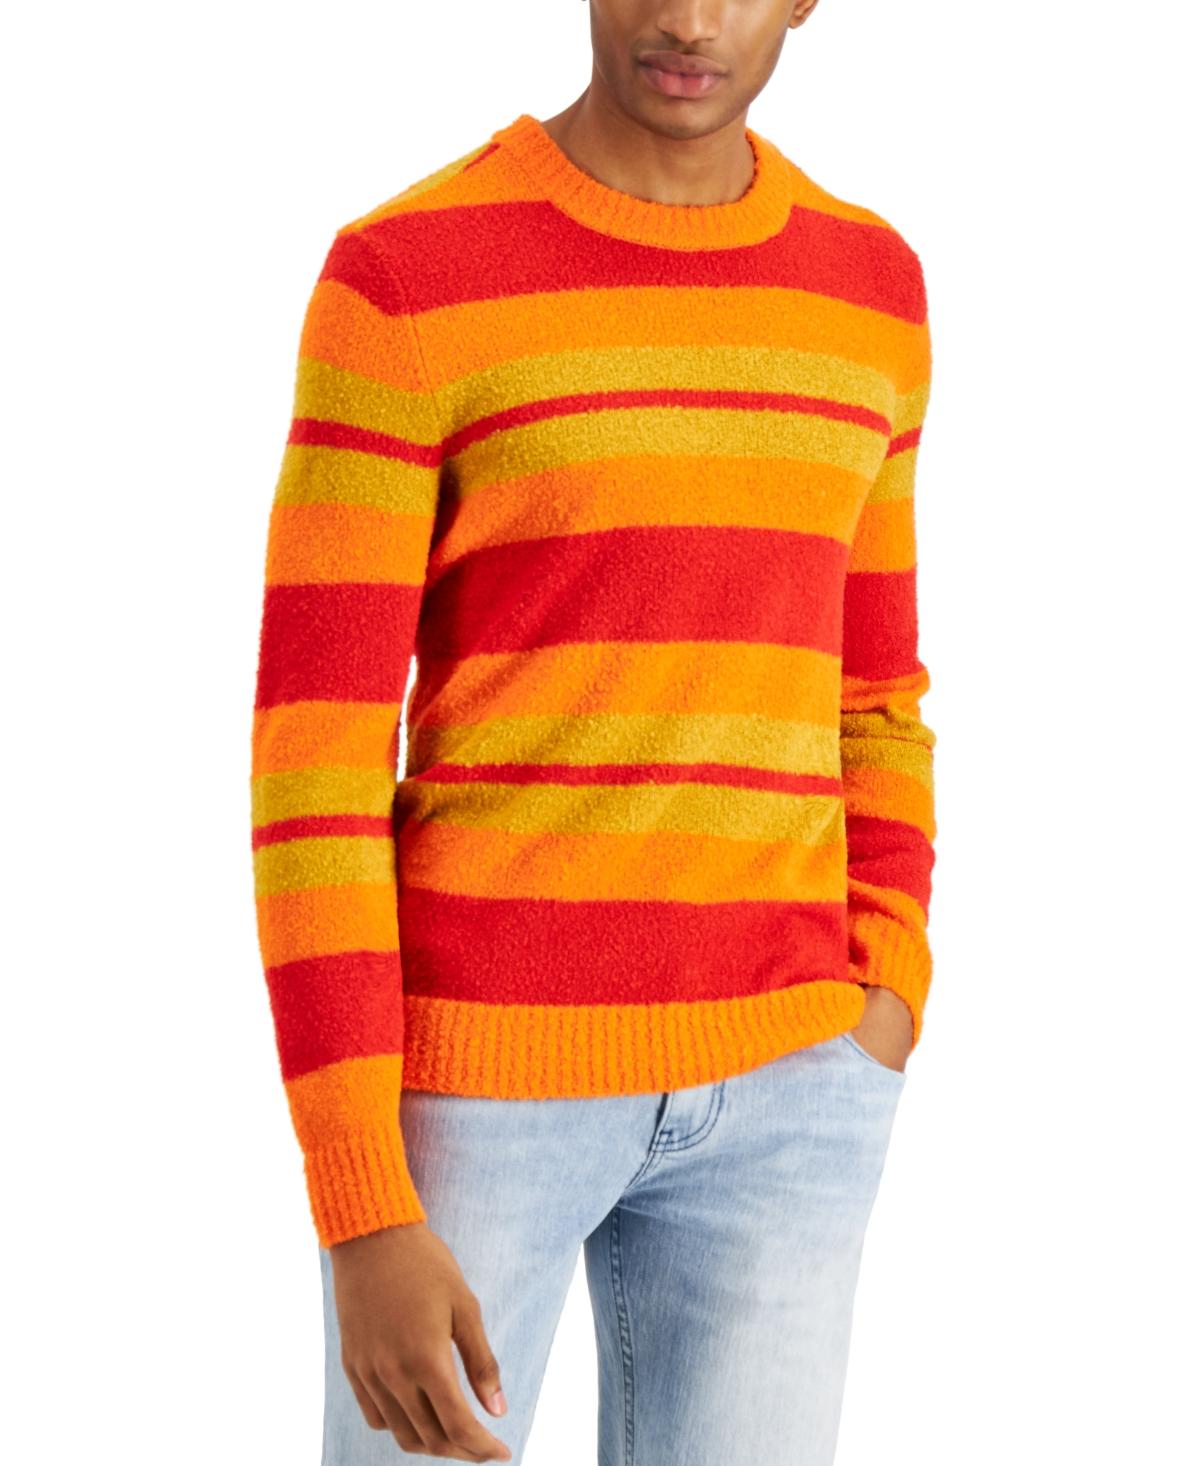 1960s Mens Shirts | 60s Mod Shirts, Hippie Shirts Inc International Concepts Mens Aaron Sweater Created for Macys $38.92 AT vintagedancer.com